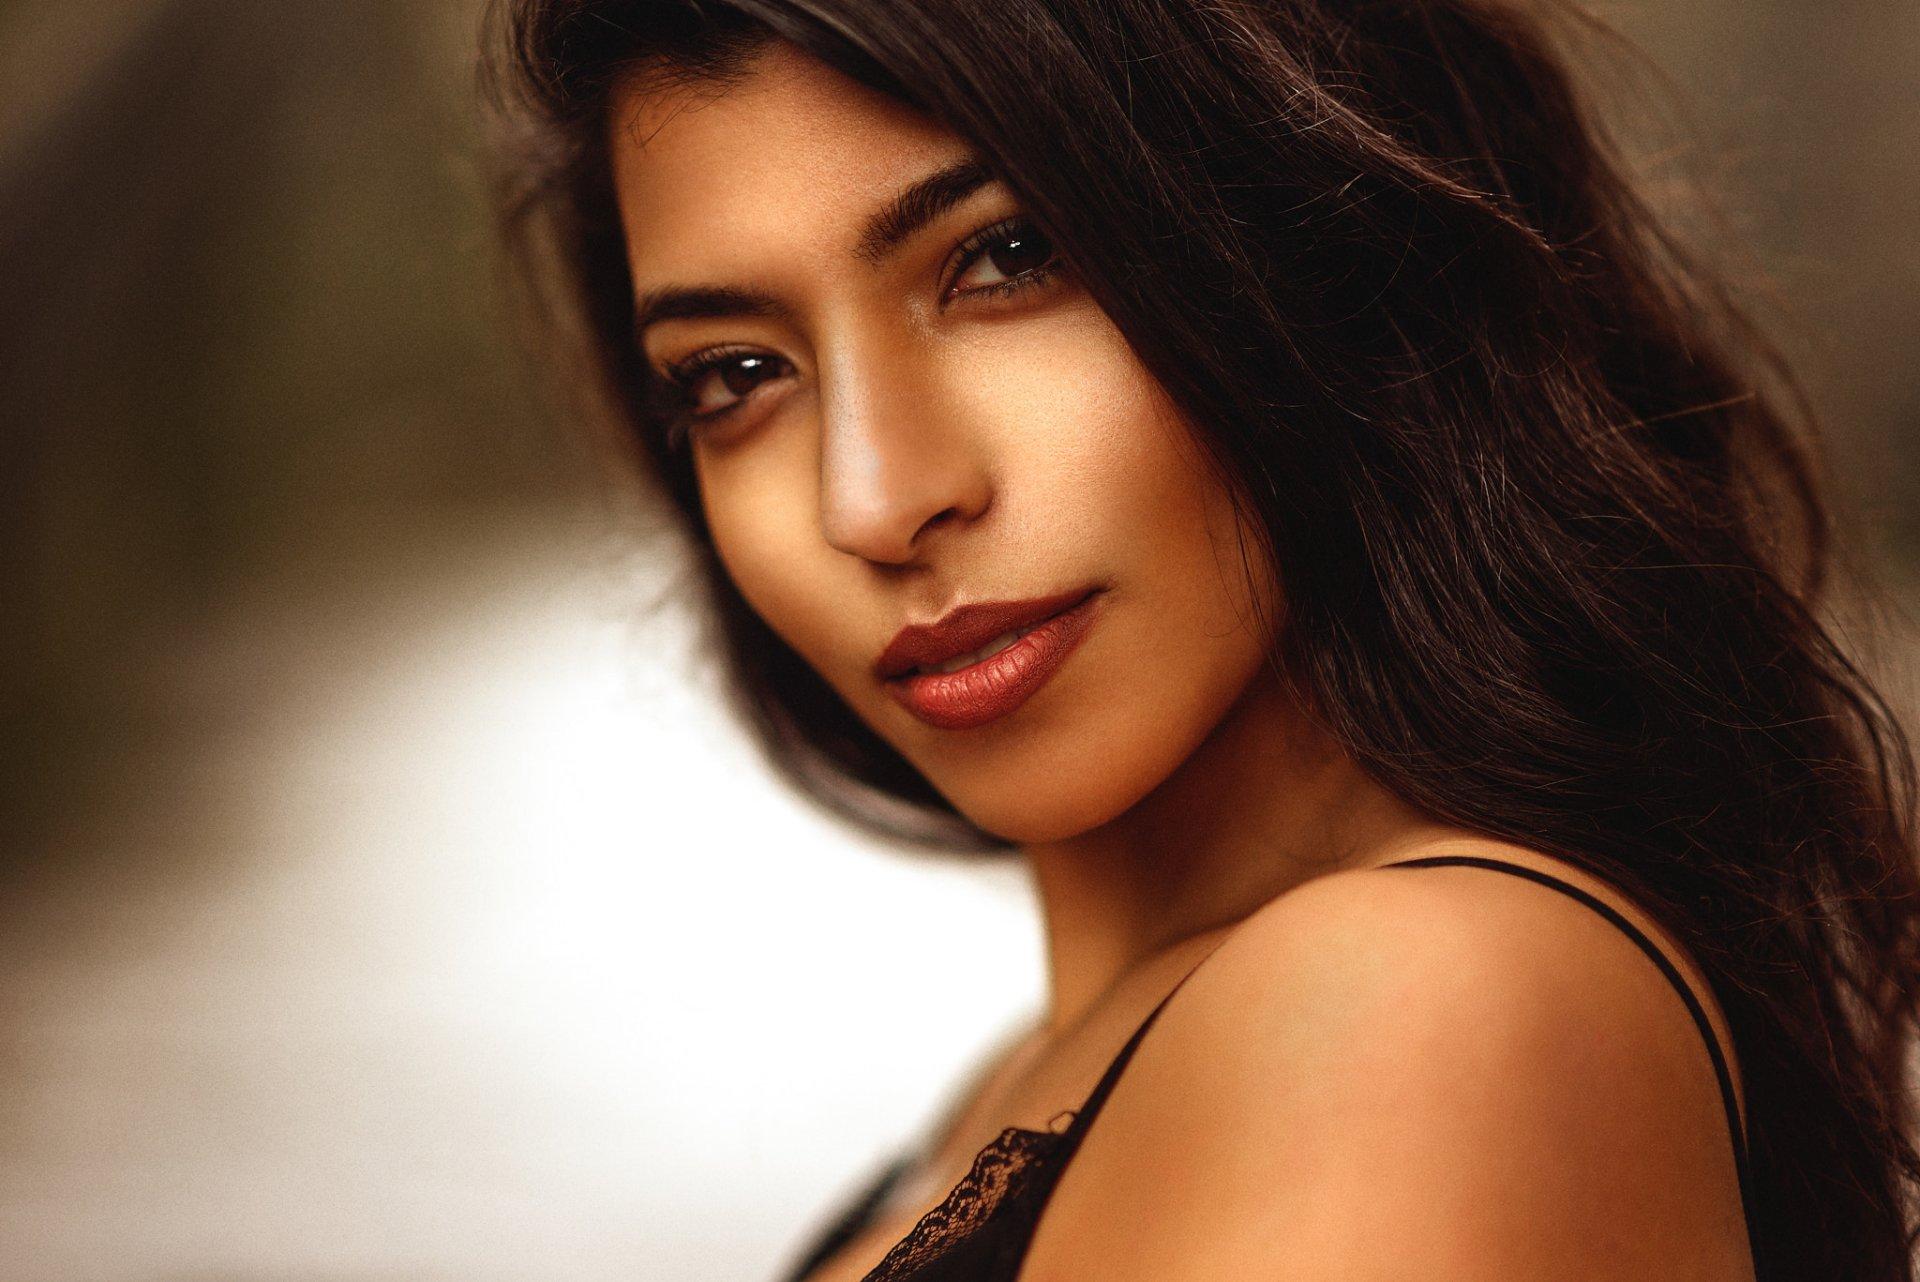 Pretty Latina HD Wallpaper   Background Image   2048x1367 ...